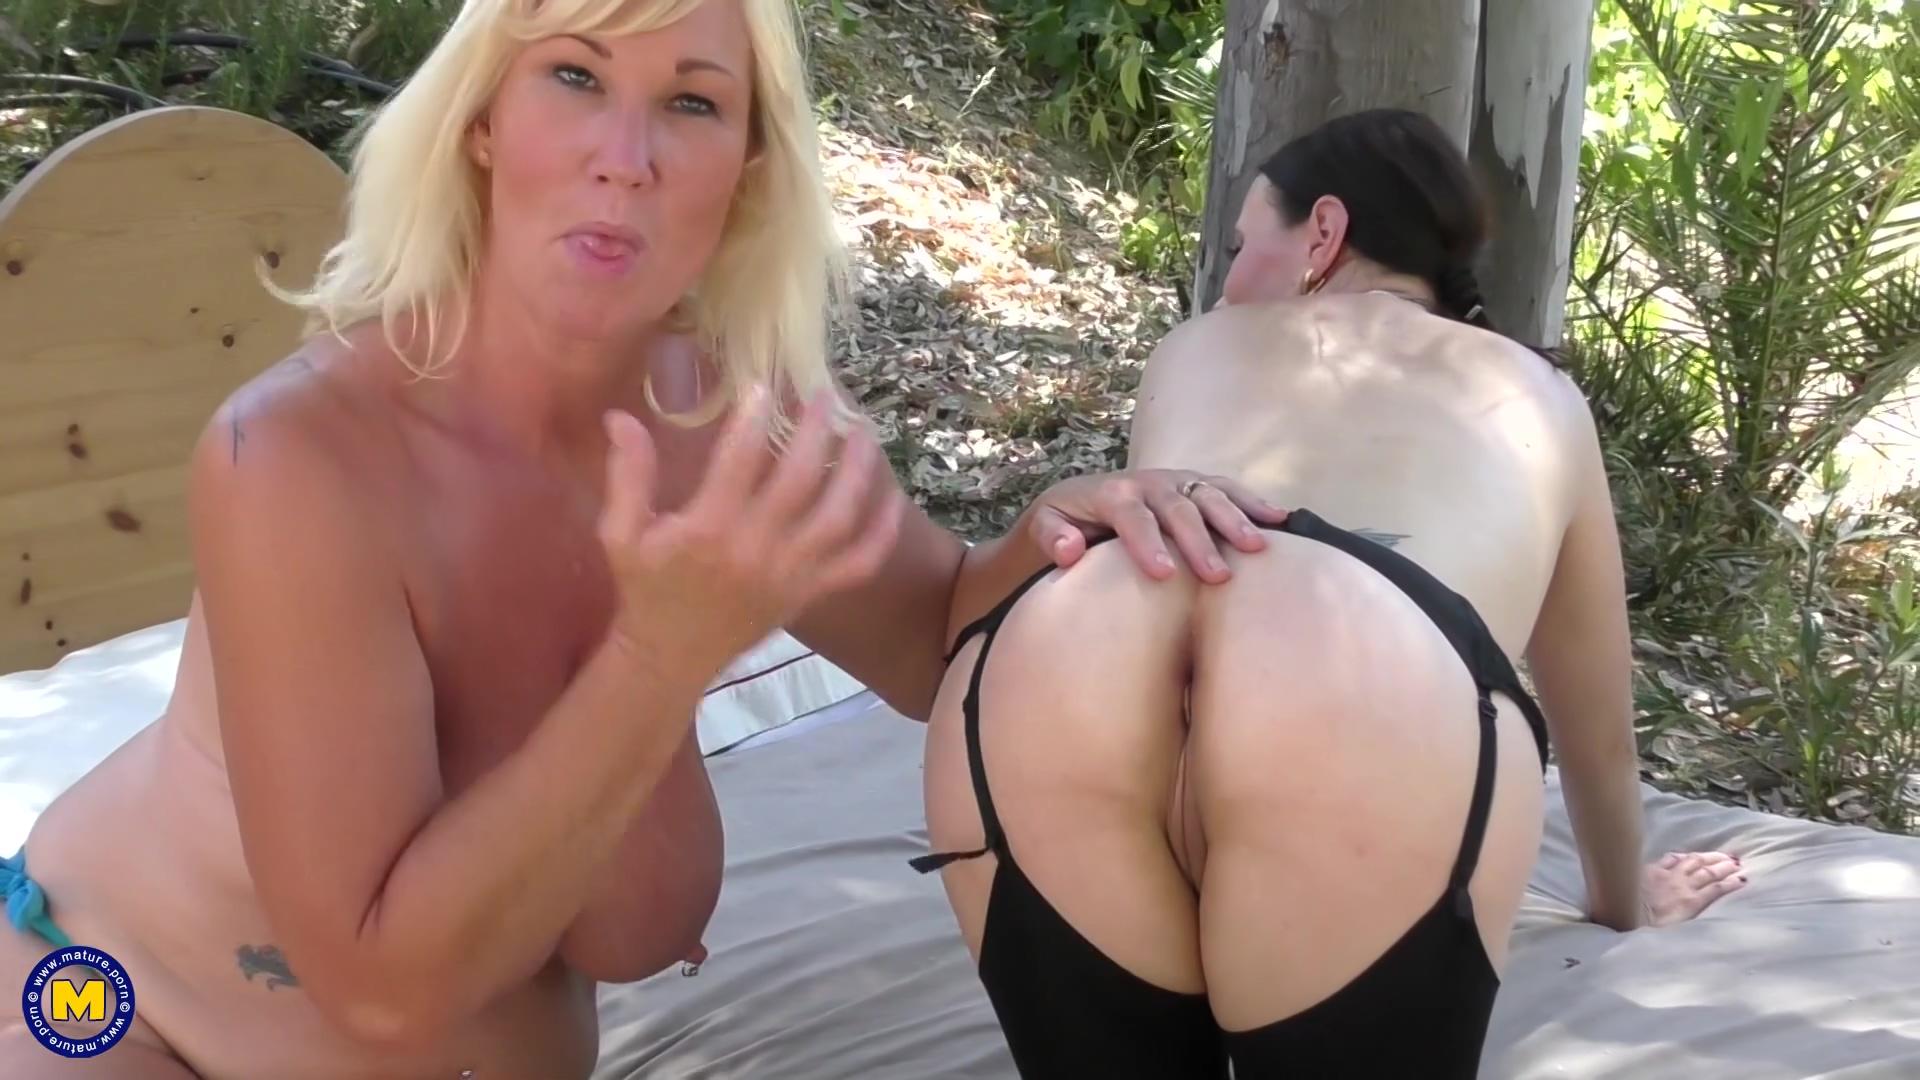 Video 1381164704: anna belle, hairy mature lesbian, hairy lesbian brunette, lesbian cunnilingus, lesbians big tits toys, big tits lesbian hd, blonde lesbians toying, mature stockings lesbian, outdoor lesbian, lesbian love